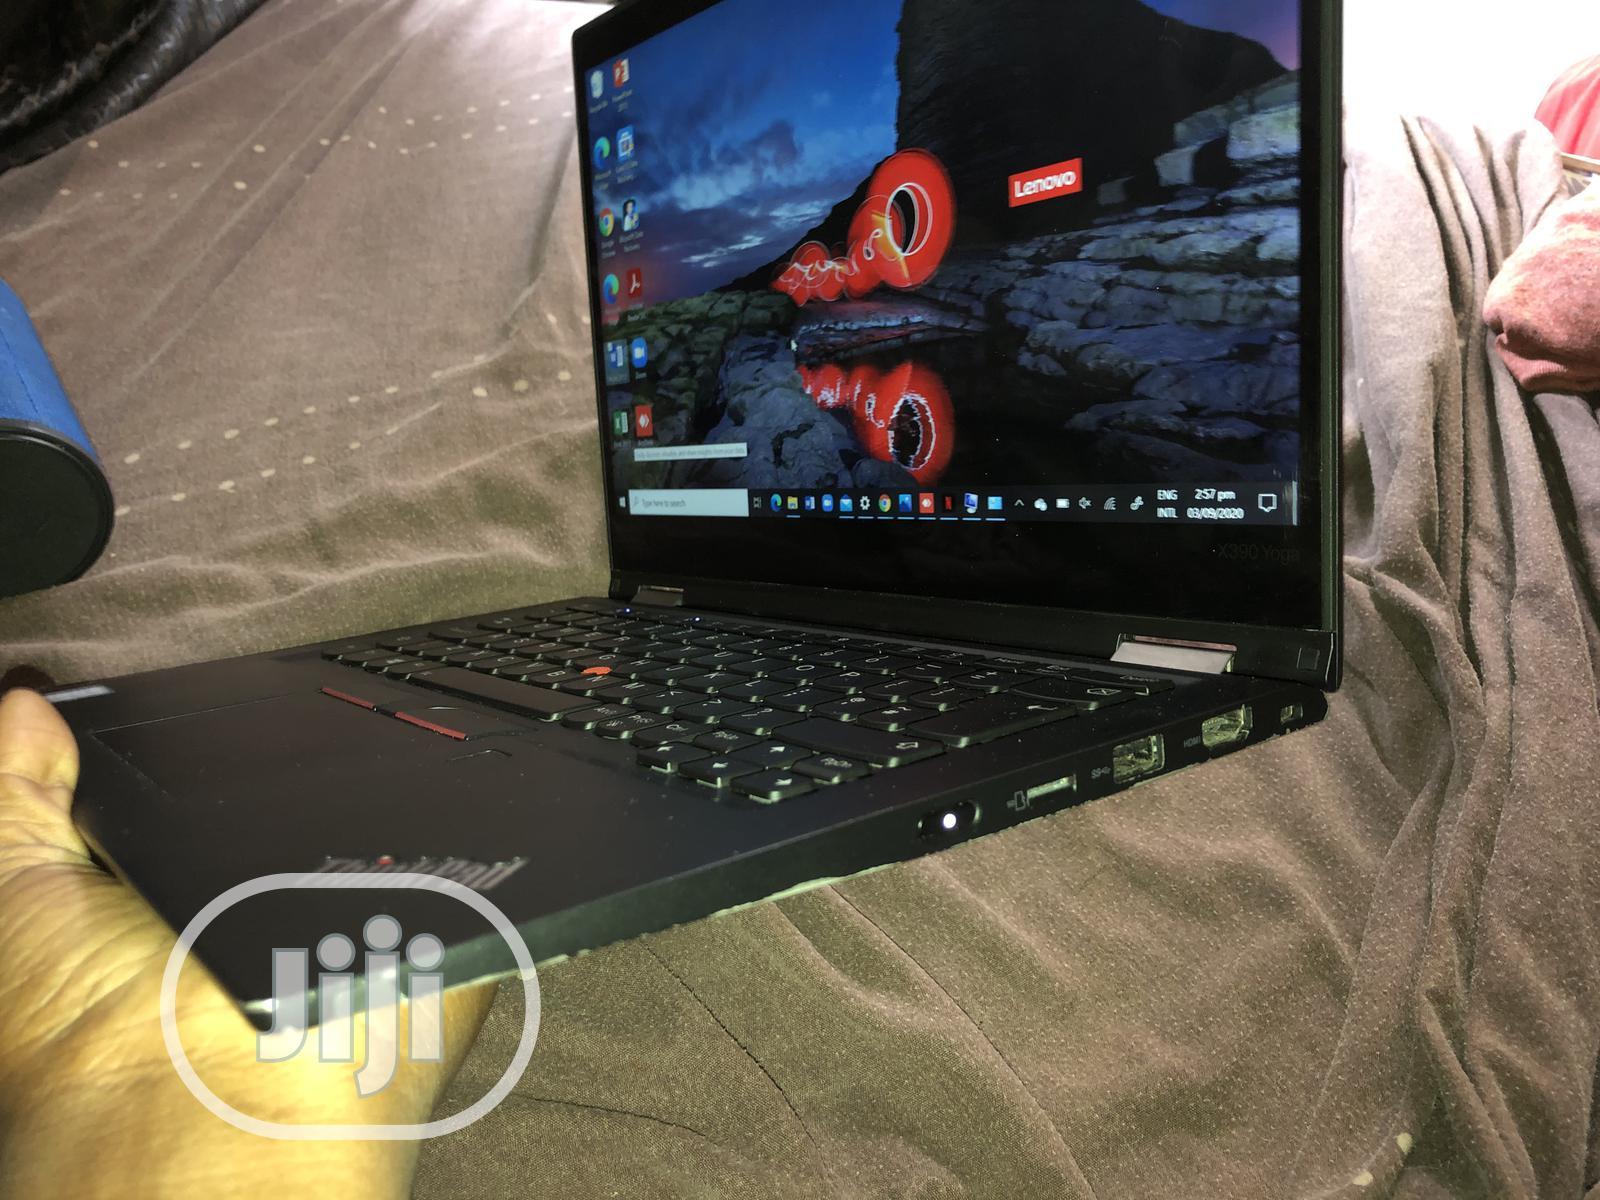 Laptop Lenovo Thinkpad Yoga 8gb Intel Core I7 Ssd 500gb In Surulere Laptops Computers Michael Femi Jiji Ng For Sale In Surulere Buy Laptops Computers From Michael Femi